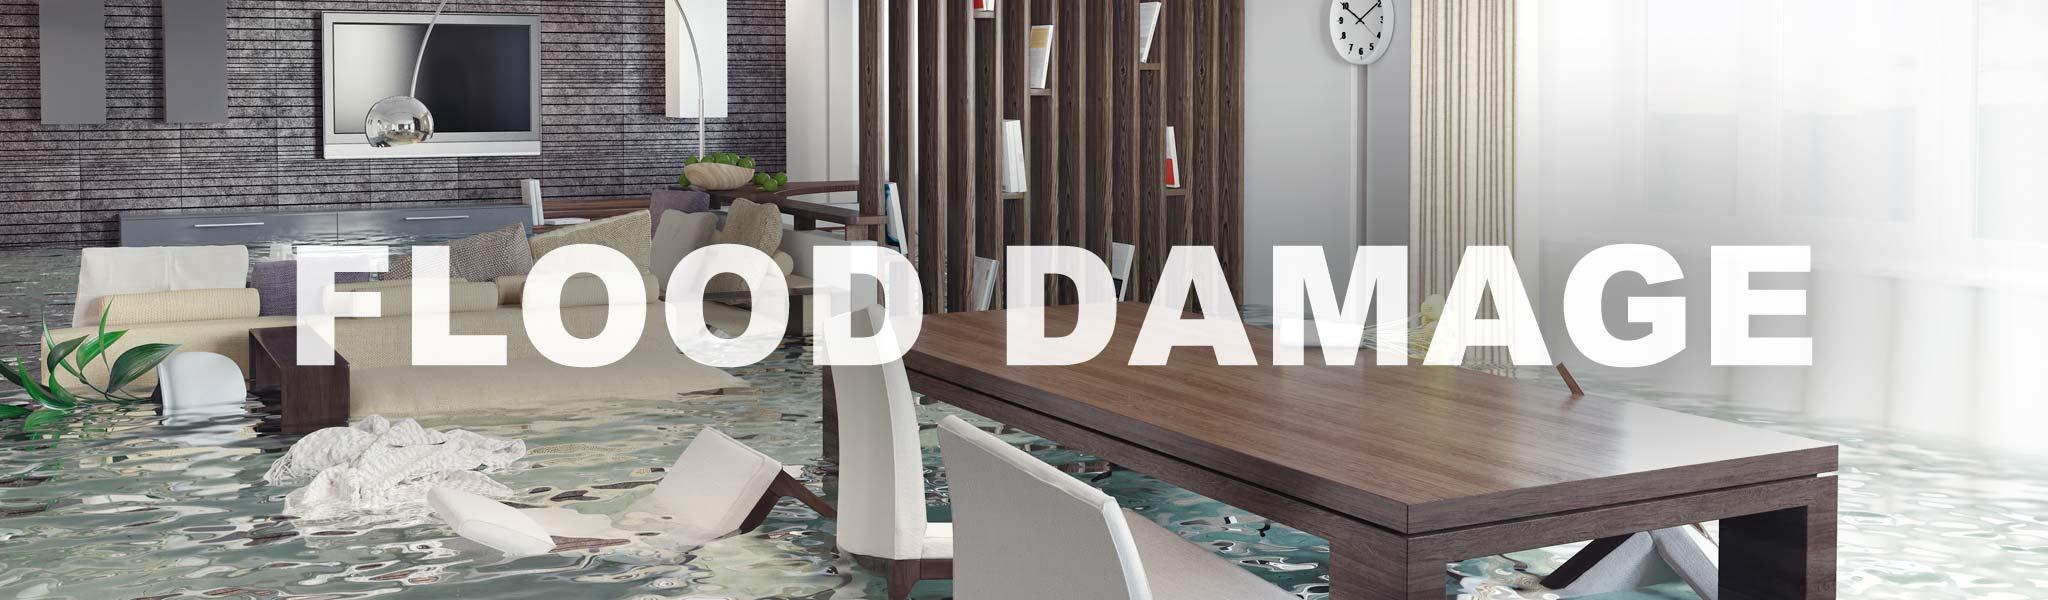 Flood Damage Claims